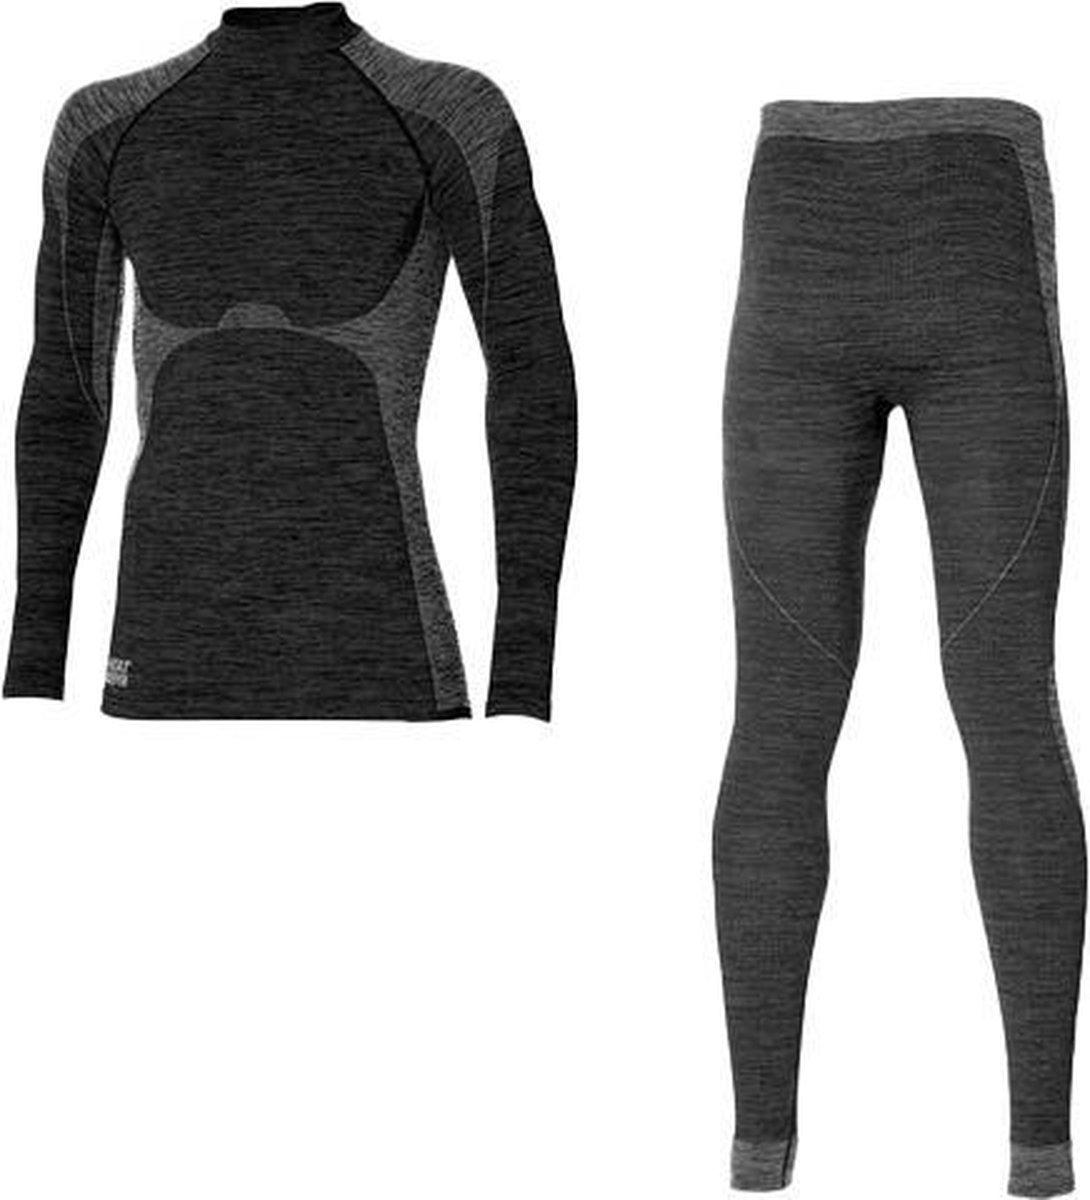 Premium thermokleding - Type: Heren, maat XL - Broek en shirt - Thermoset